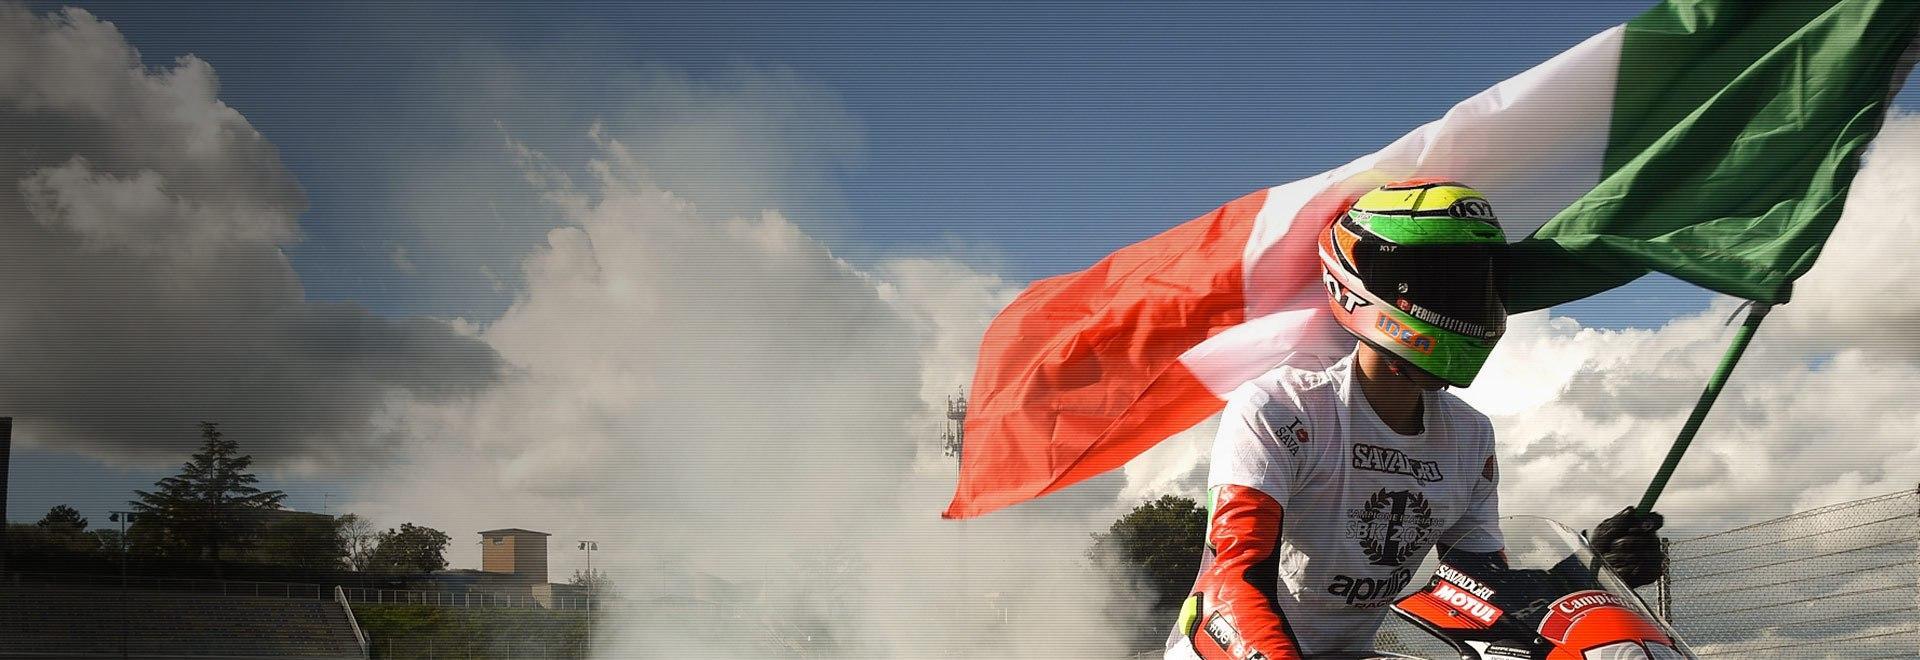 GP Misano: Supersport. Race 1